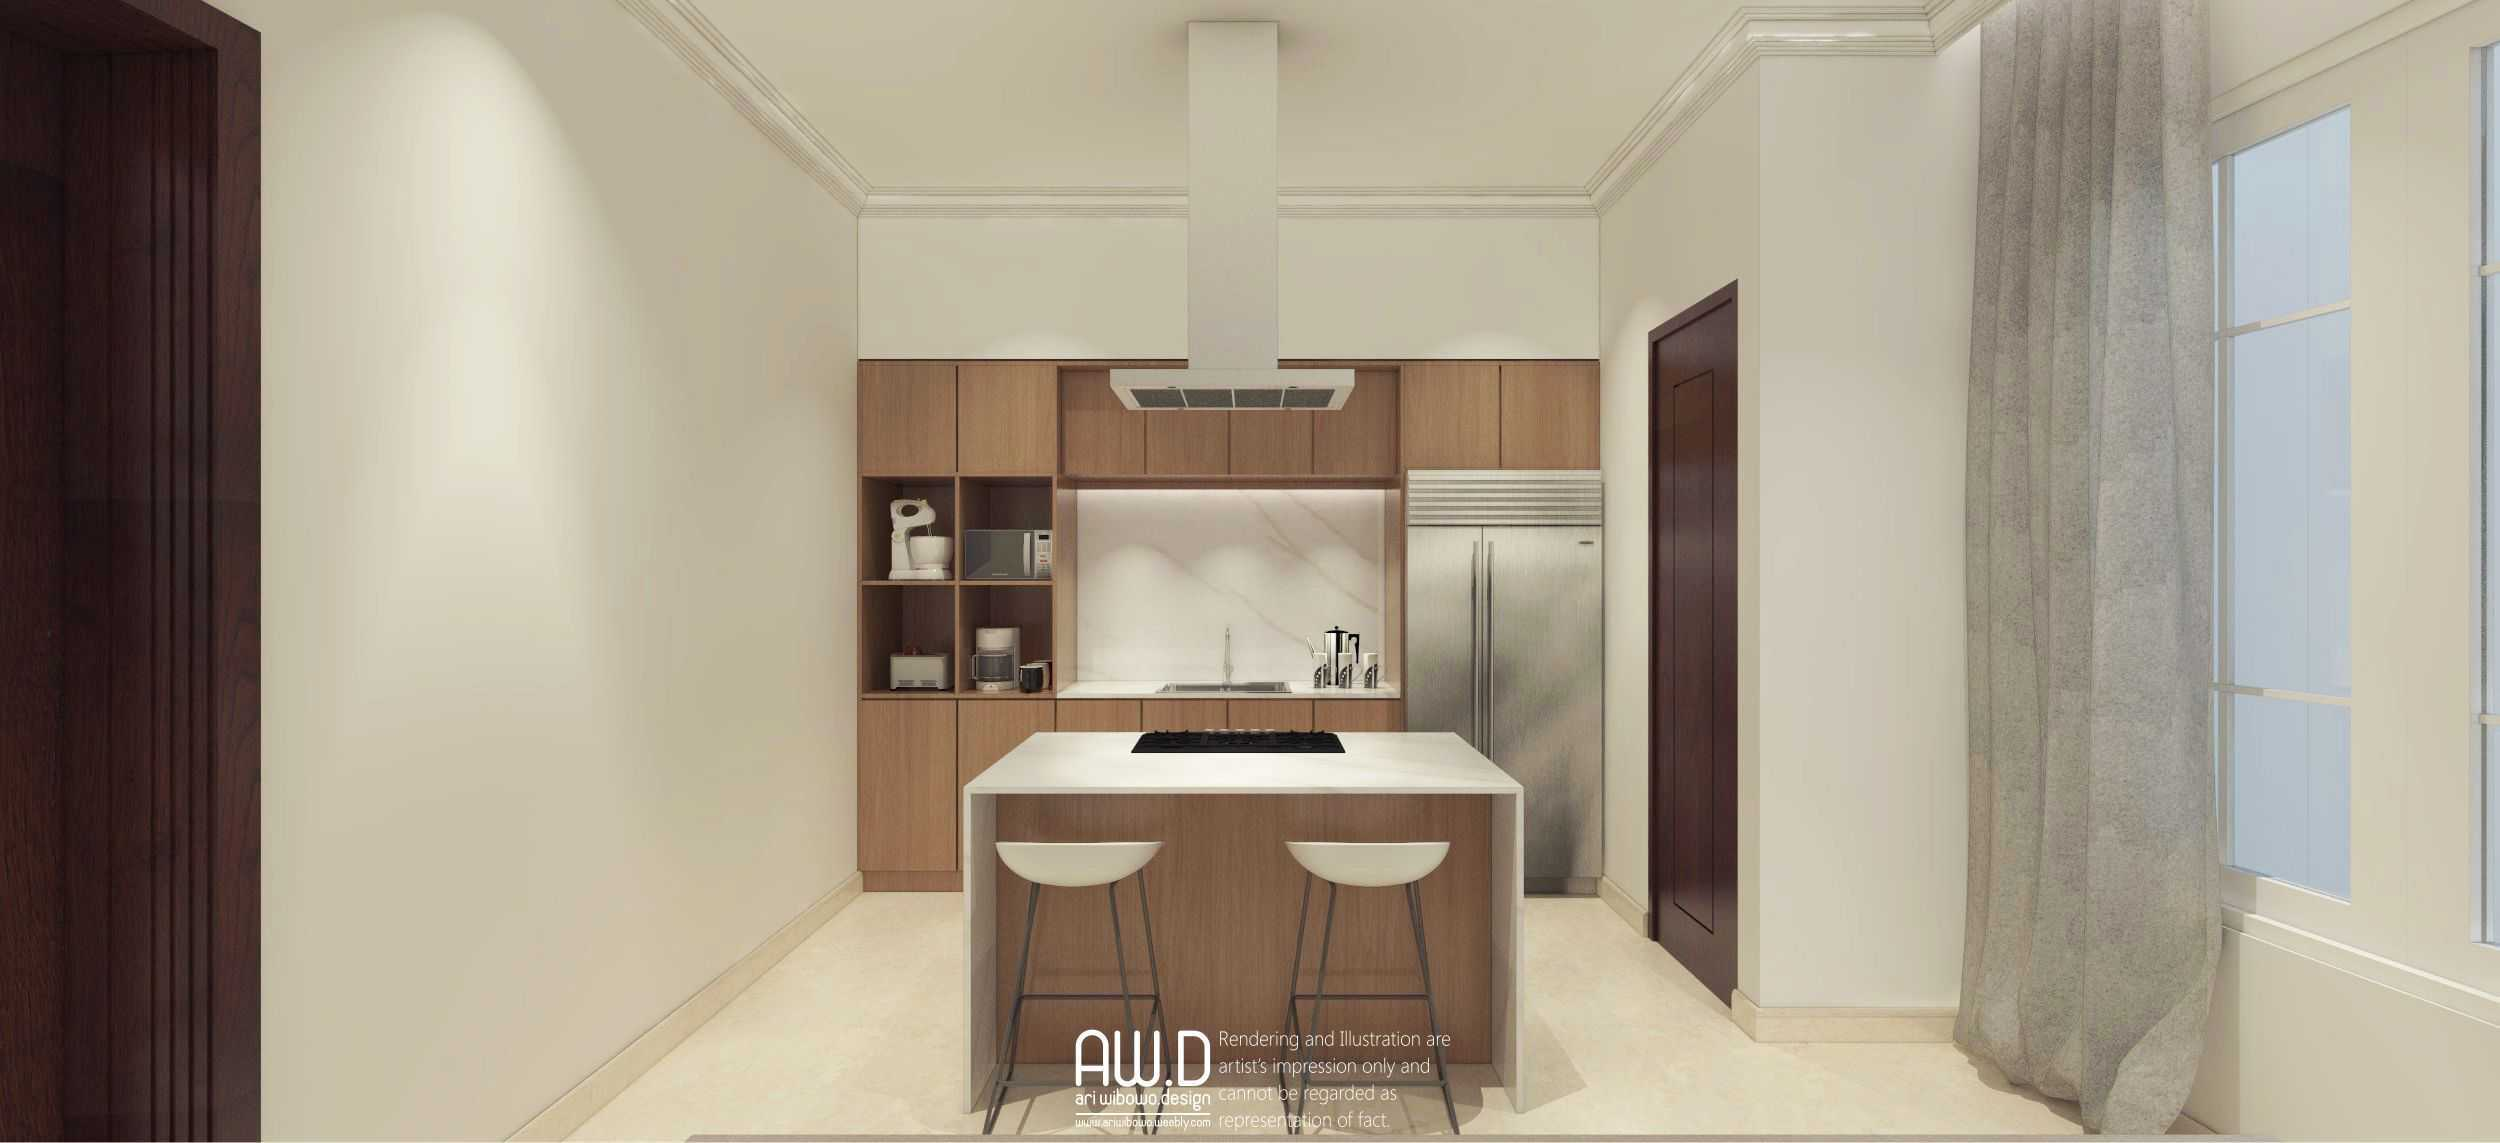 Ari Wibowo Design (Aw.d) Hw House Makassar Makassar Kitchen Area Klasik,modern  19866